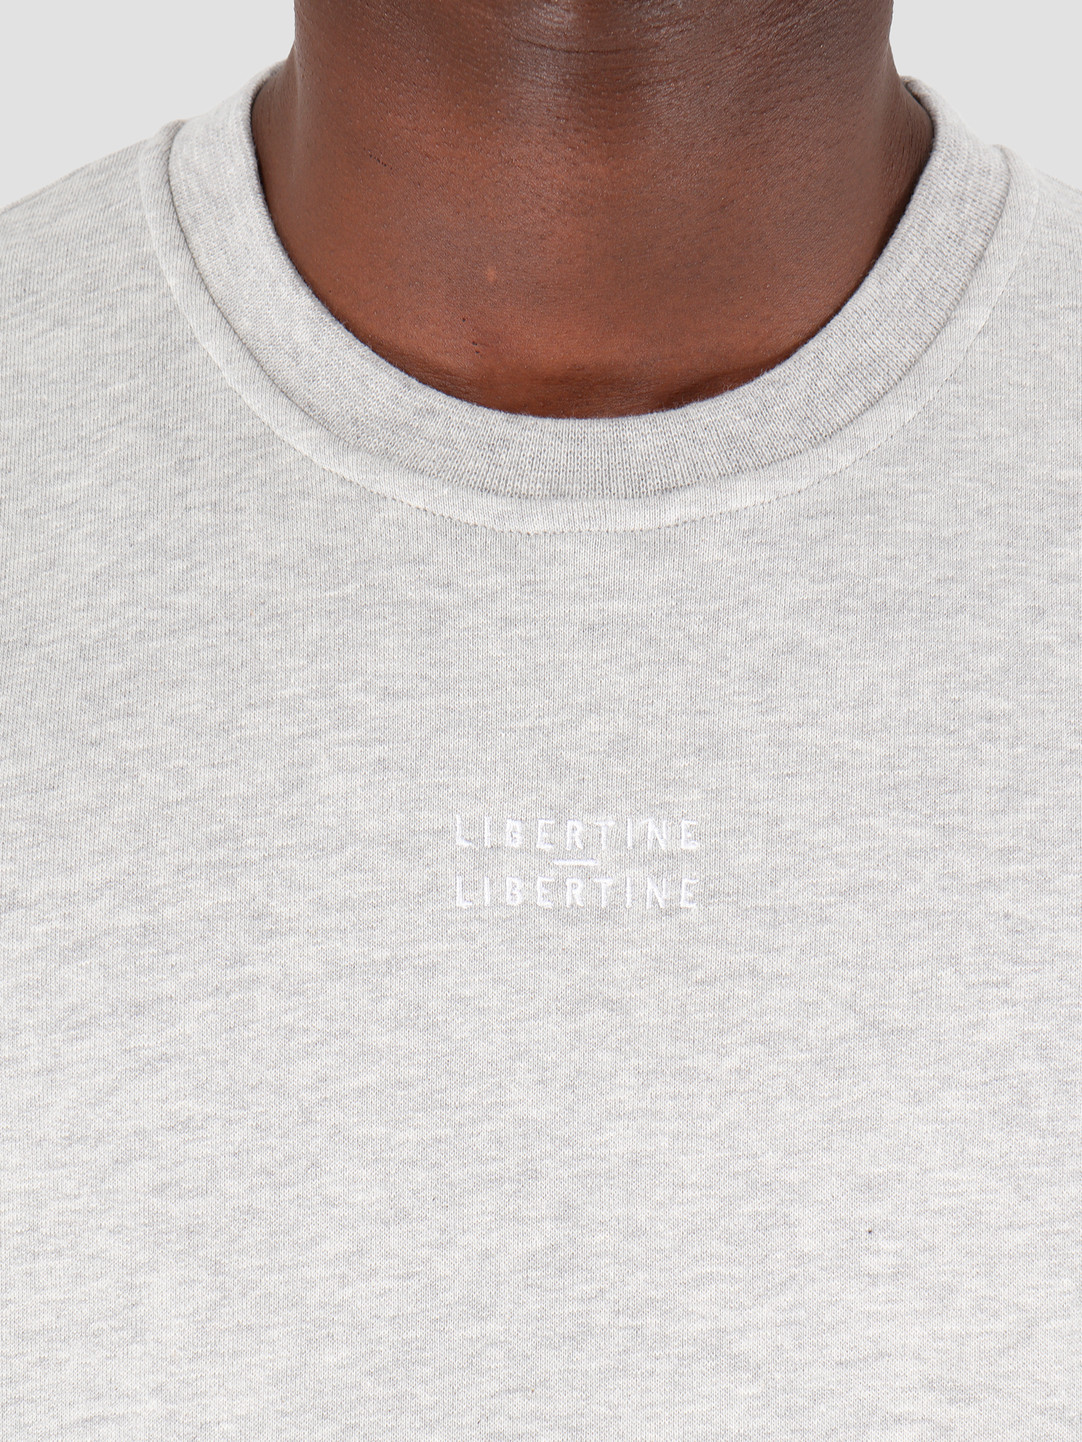 Libertine Libertine Libertine Libertine Society Logo O-Neck Grey Melange 1752